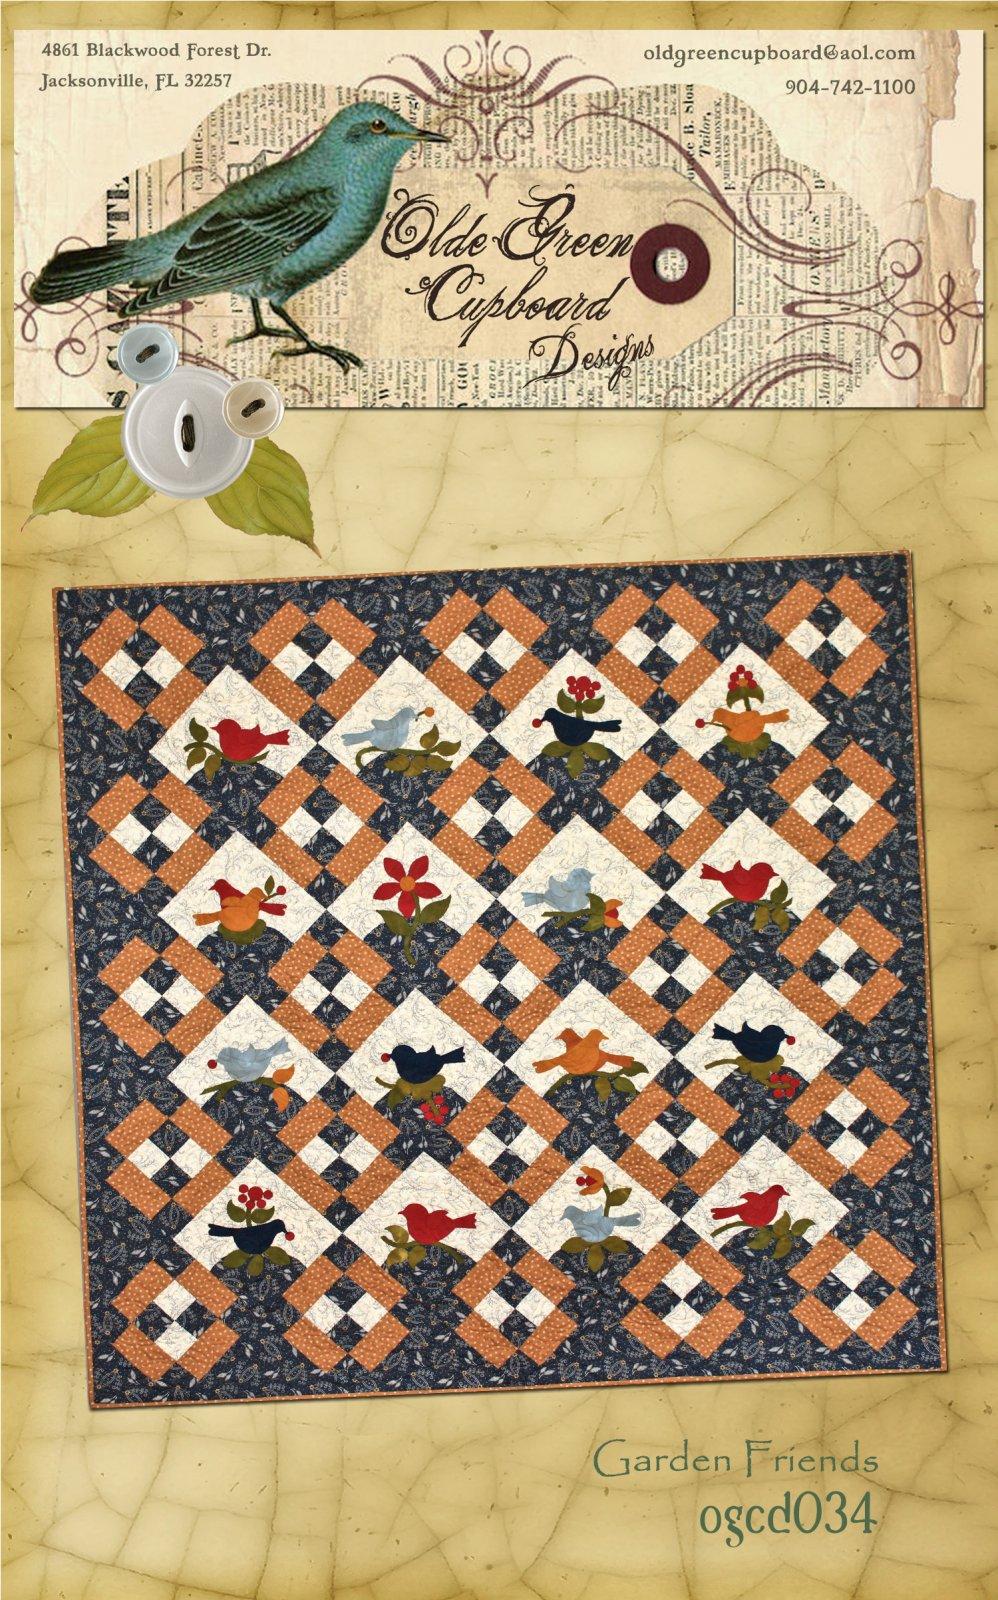 Garden Friends Quilt Pattern - OGCD034